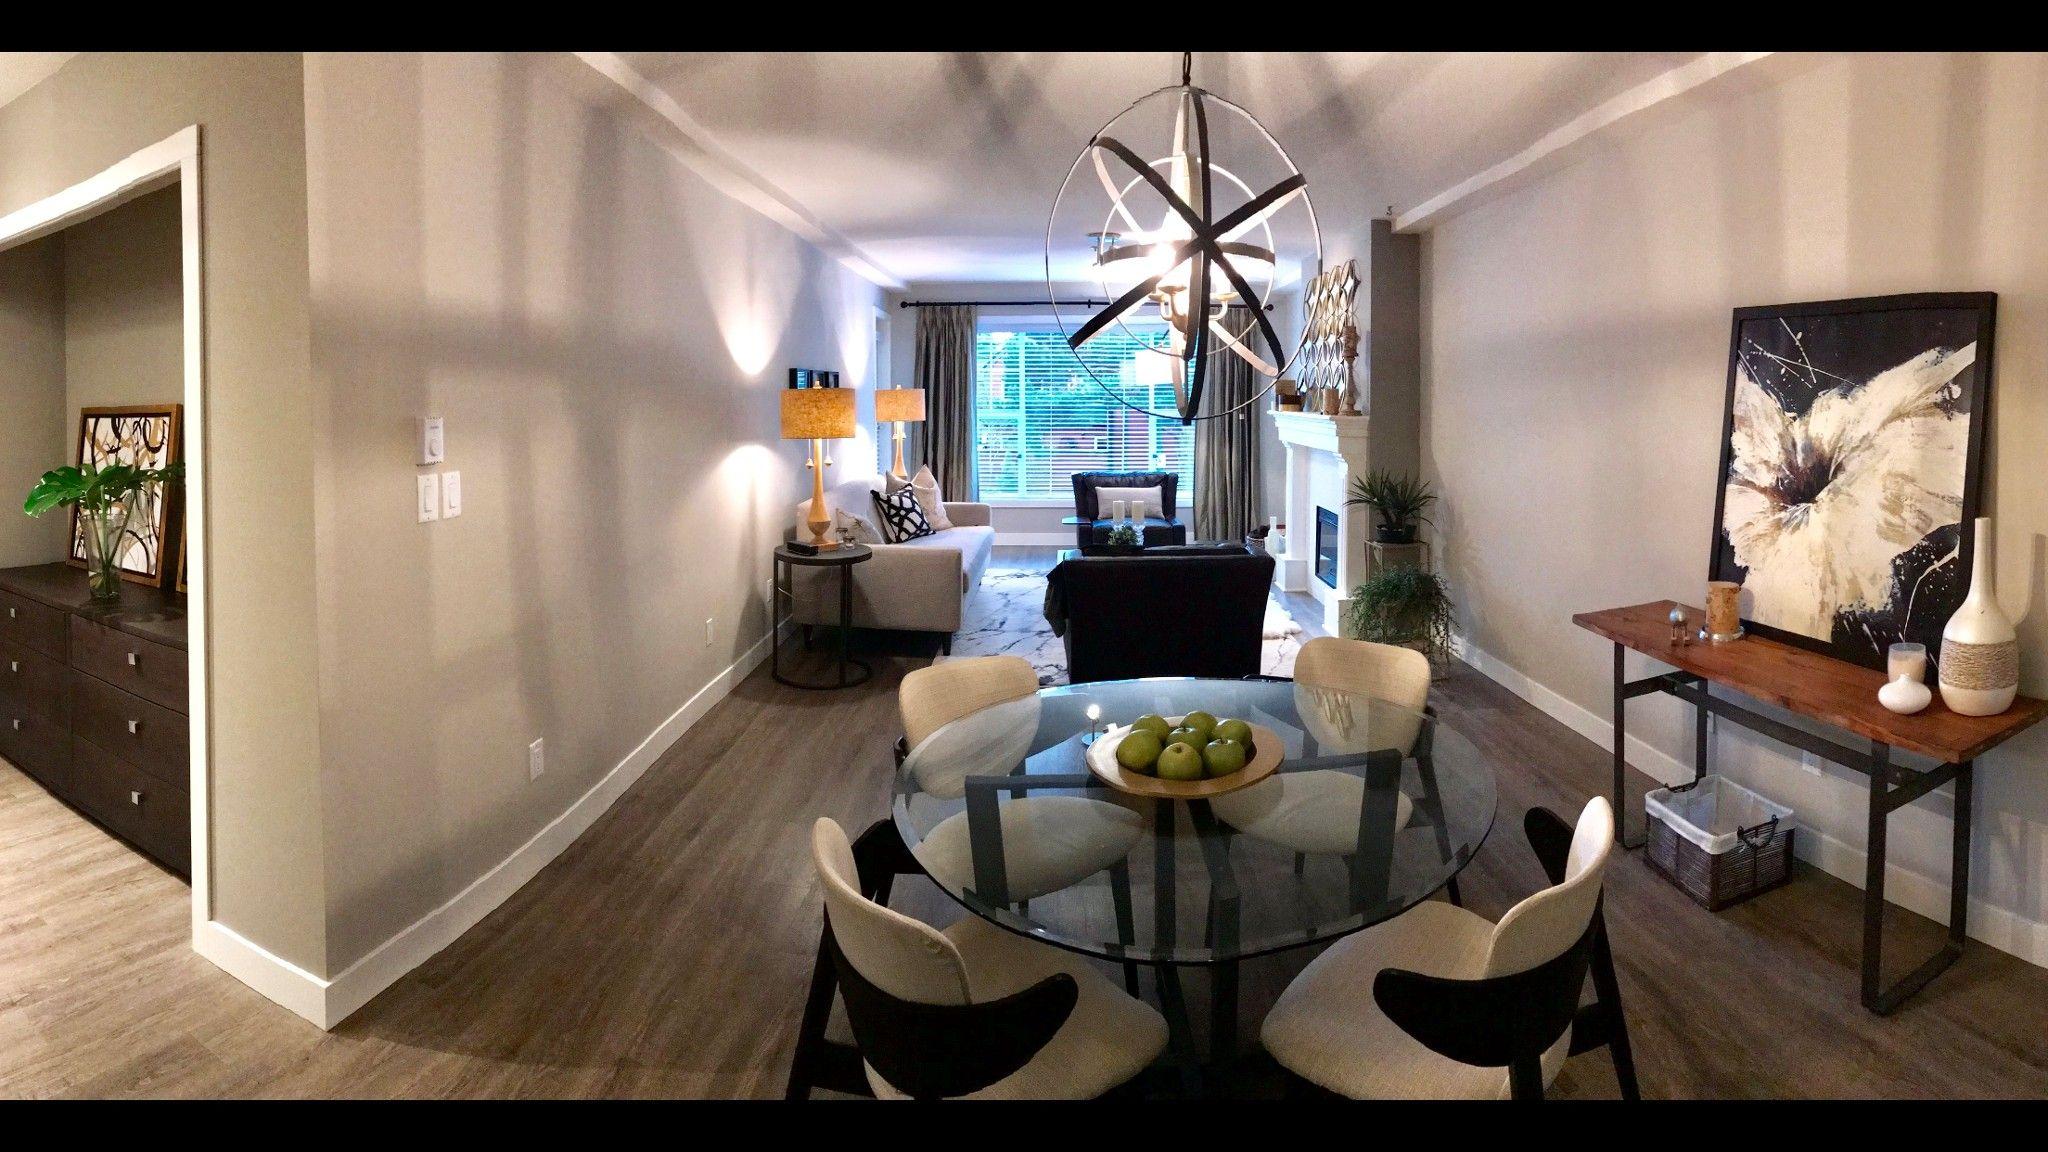 Main Photo: 209 1150 54A Street in Delta: Tsawwassen Central Condo for sale (Tsawwassen)  : MLS®# R2243733